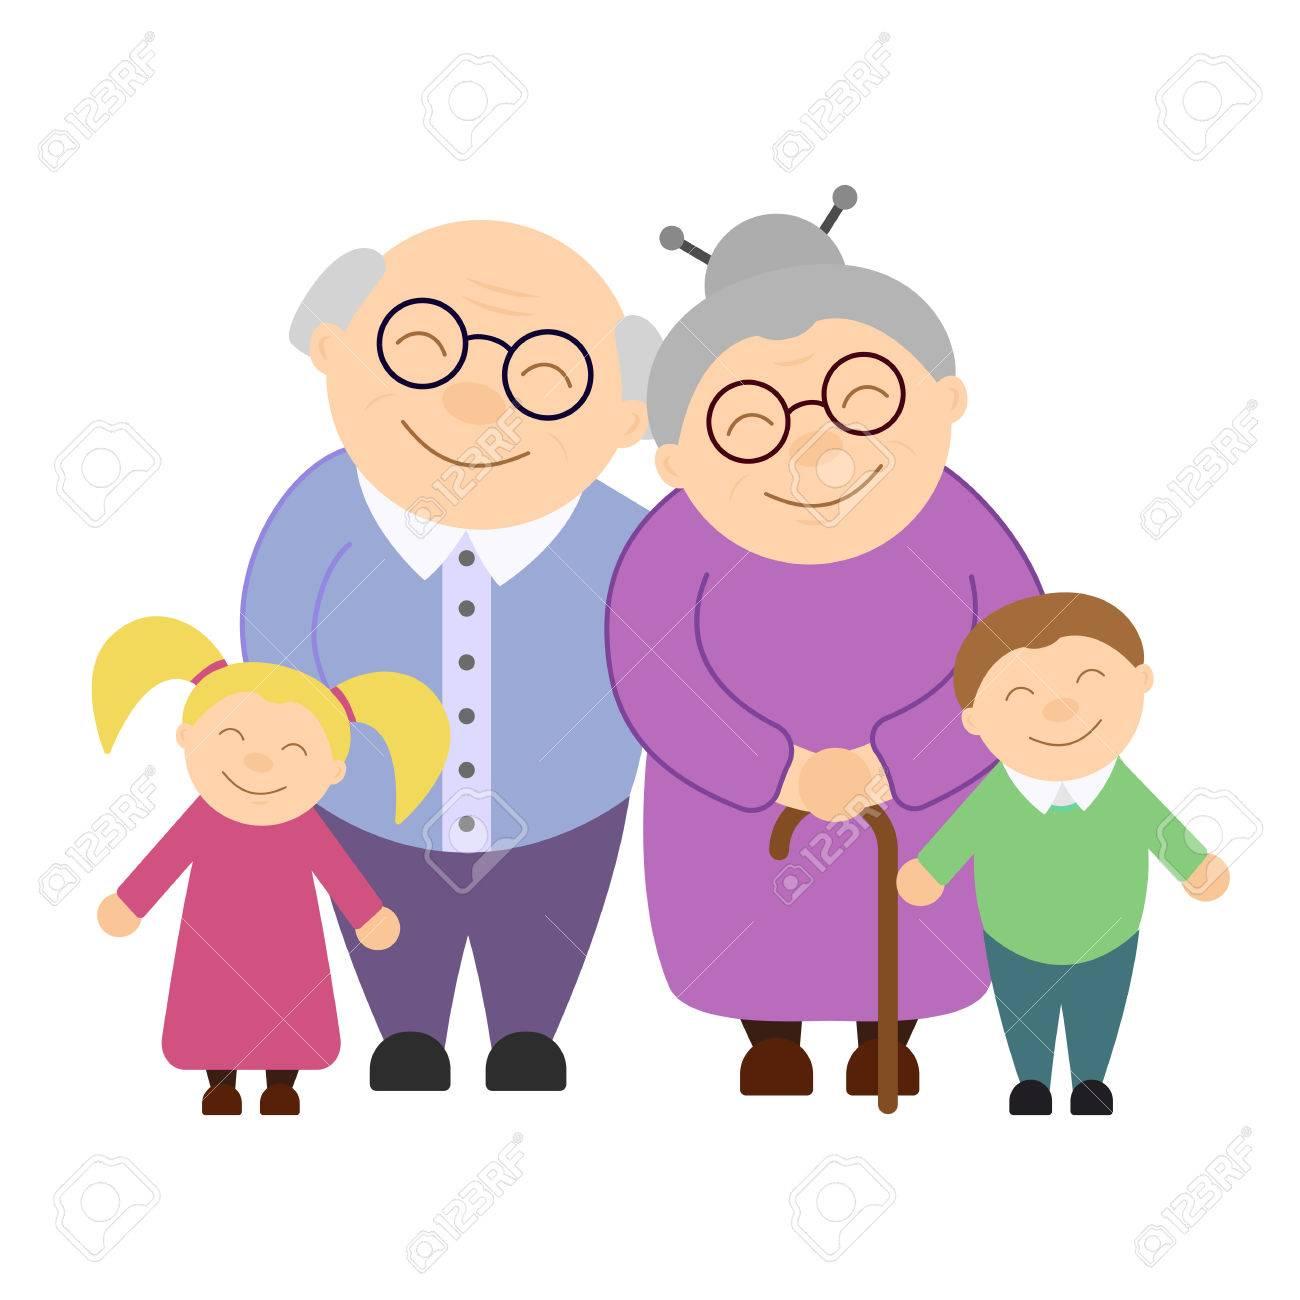 Cute grandparents with grandchildren - 84437705